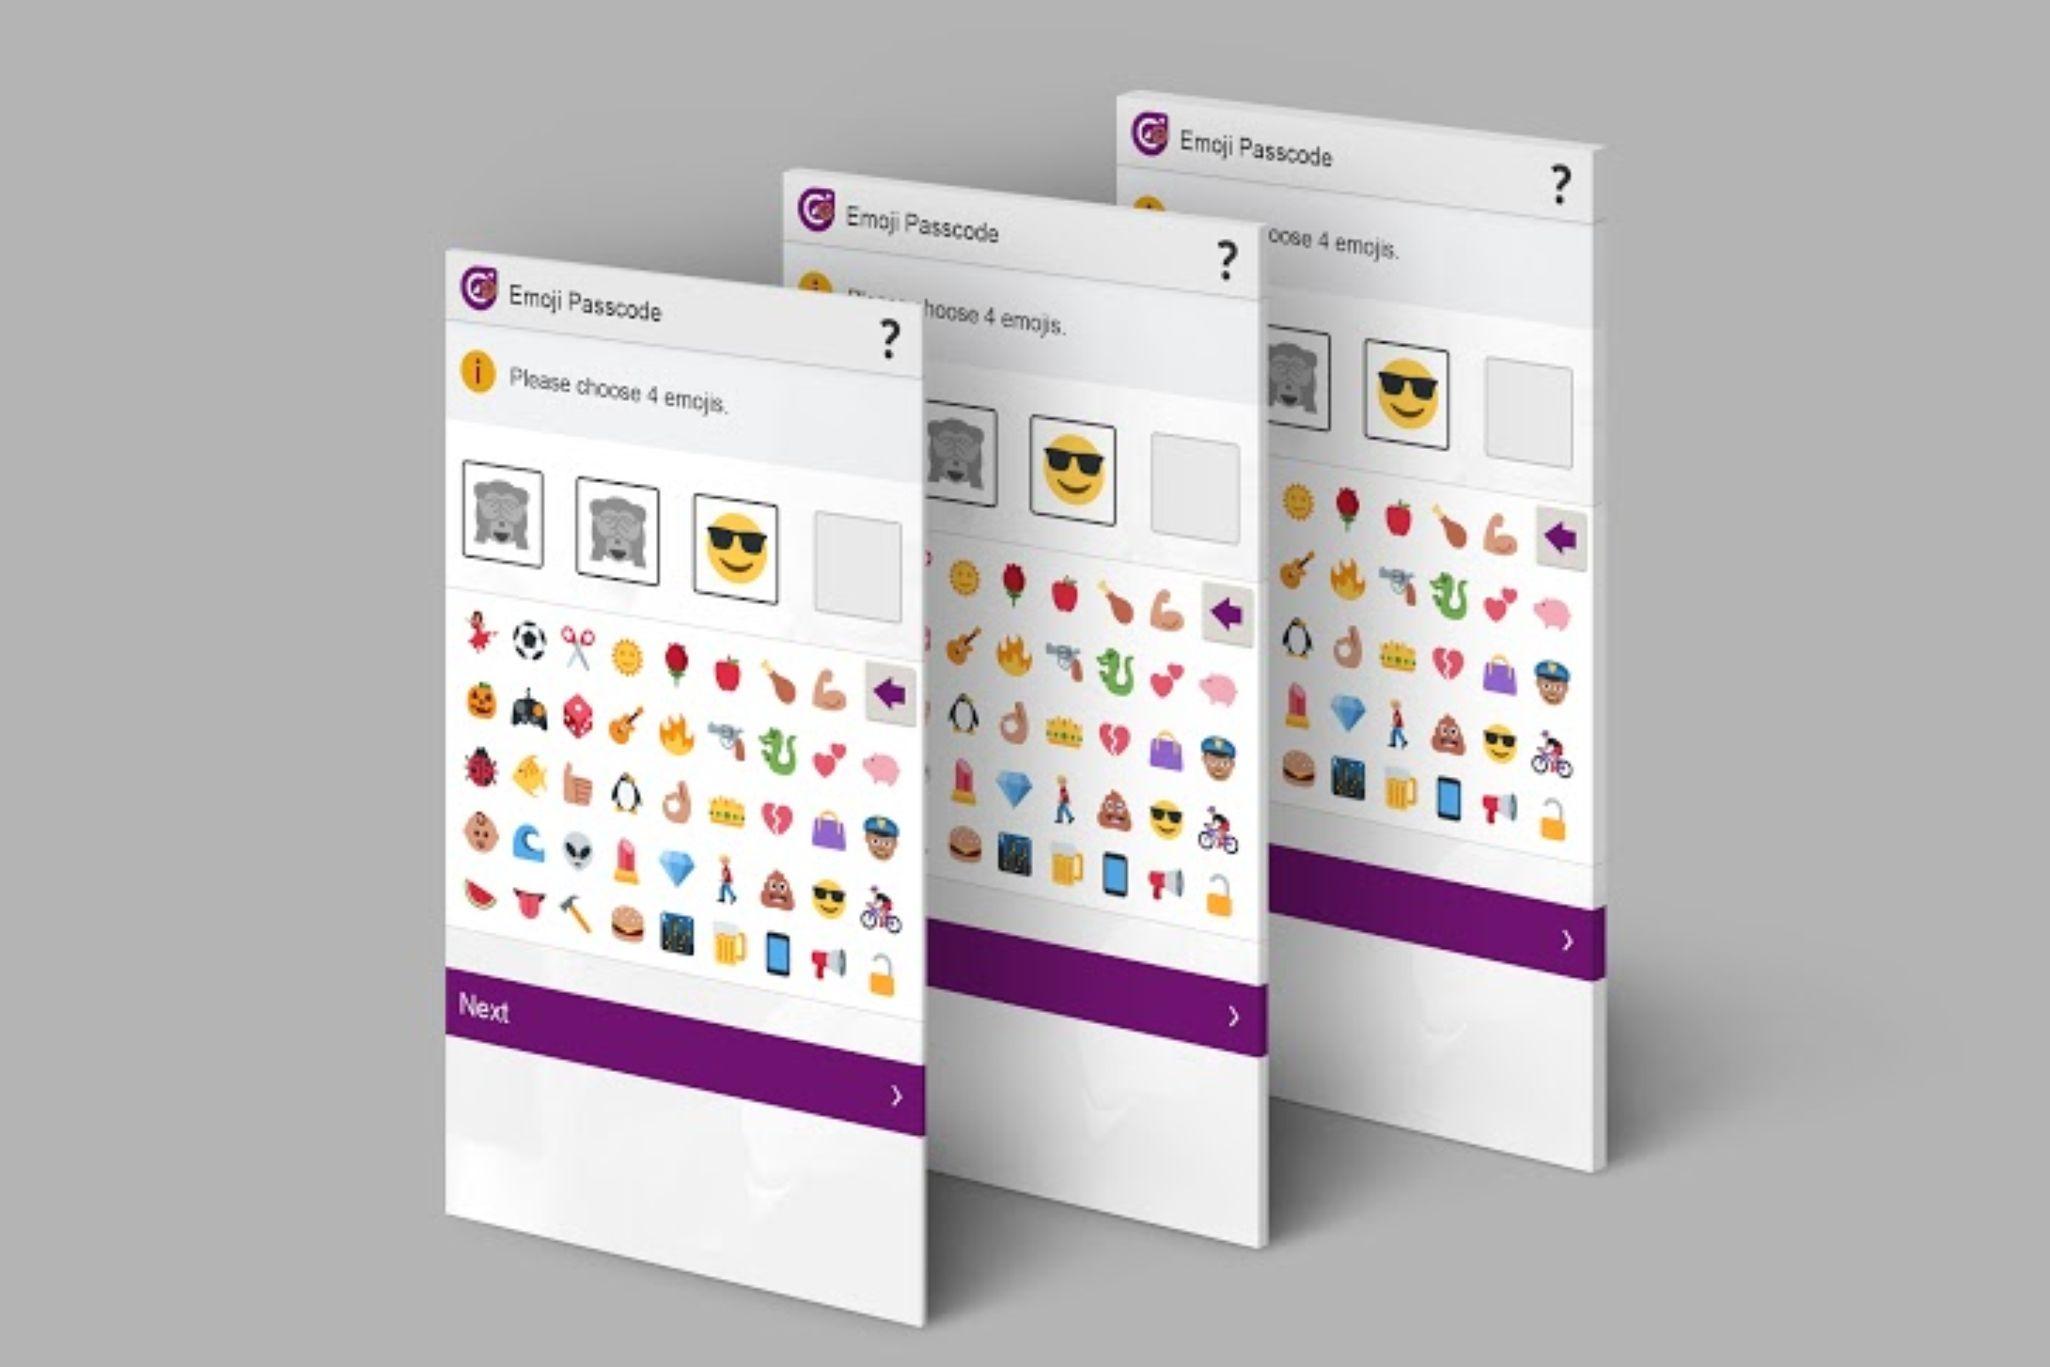 emoji-parola-210615